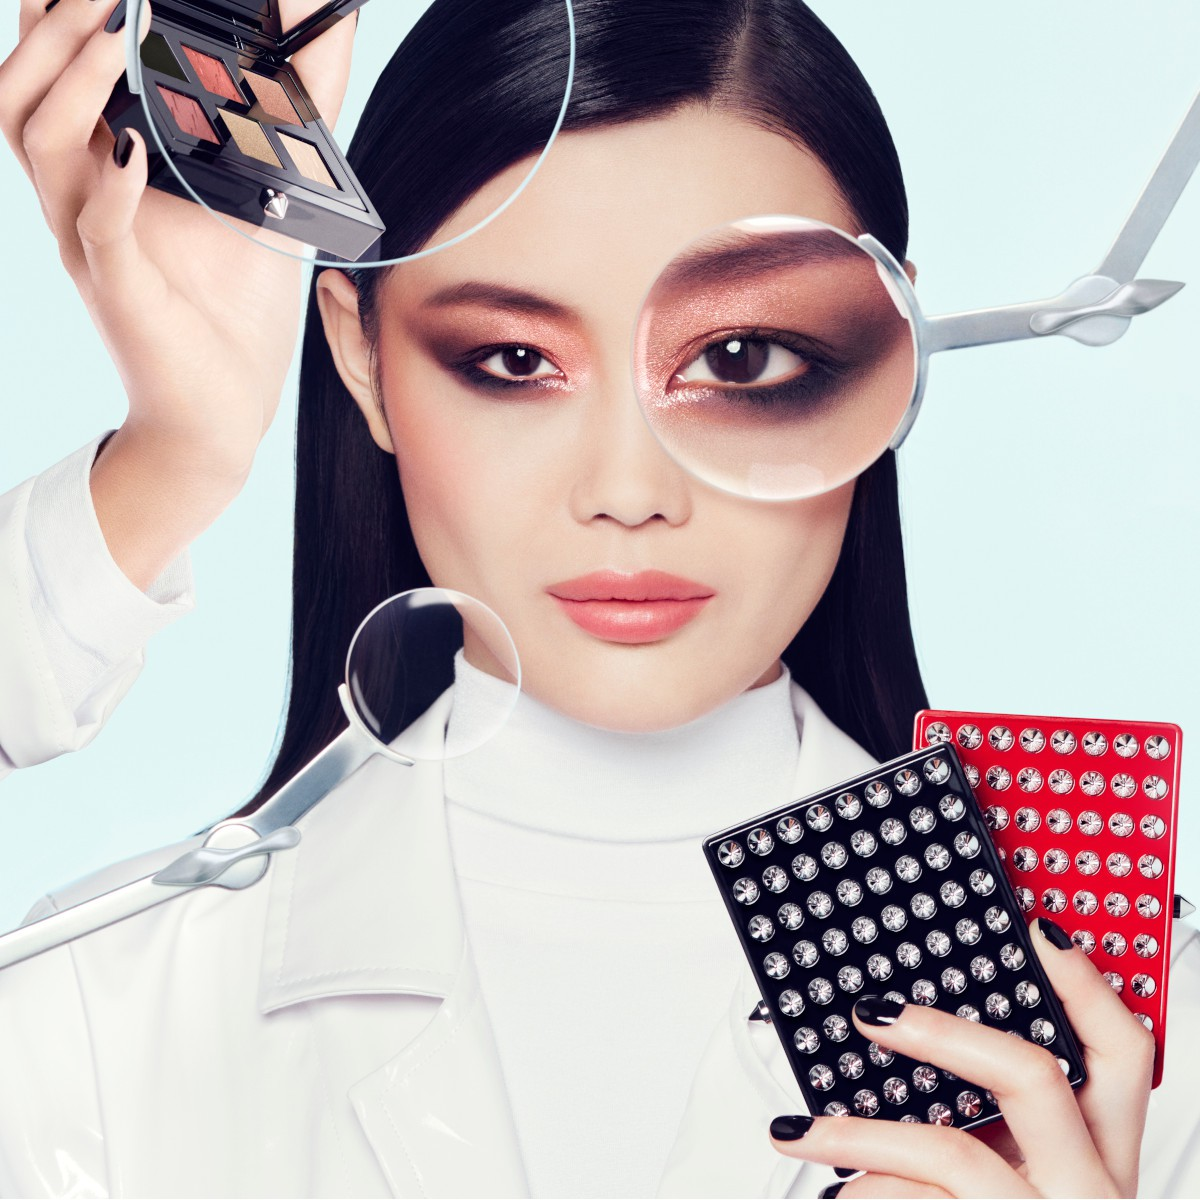 Beauty - So Delikate - Christian Louboutin